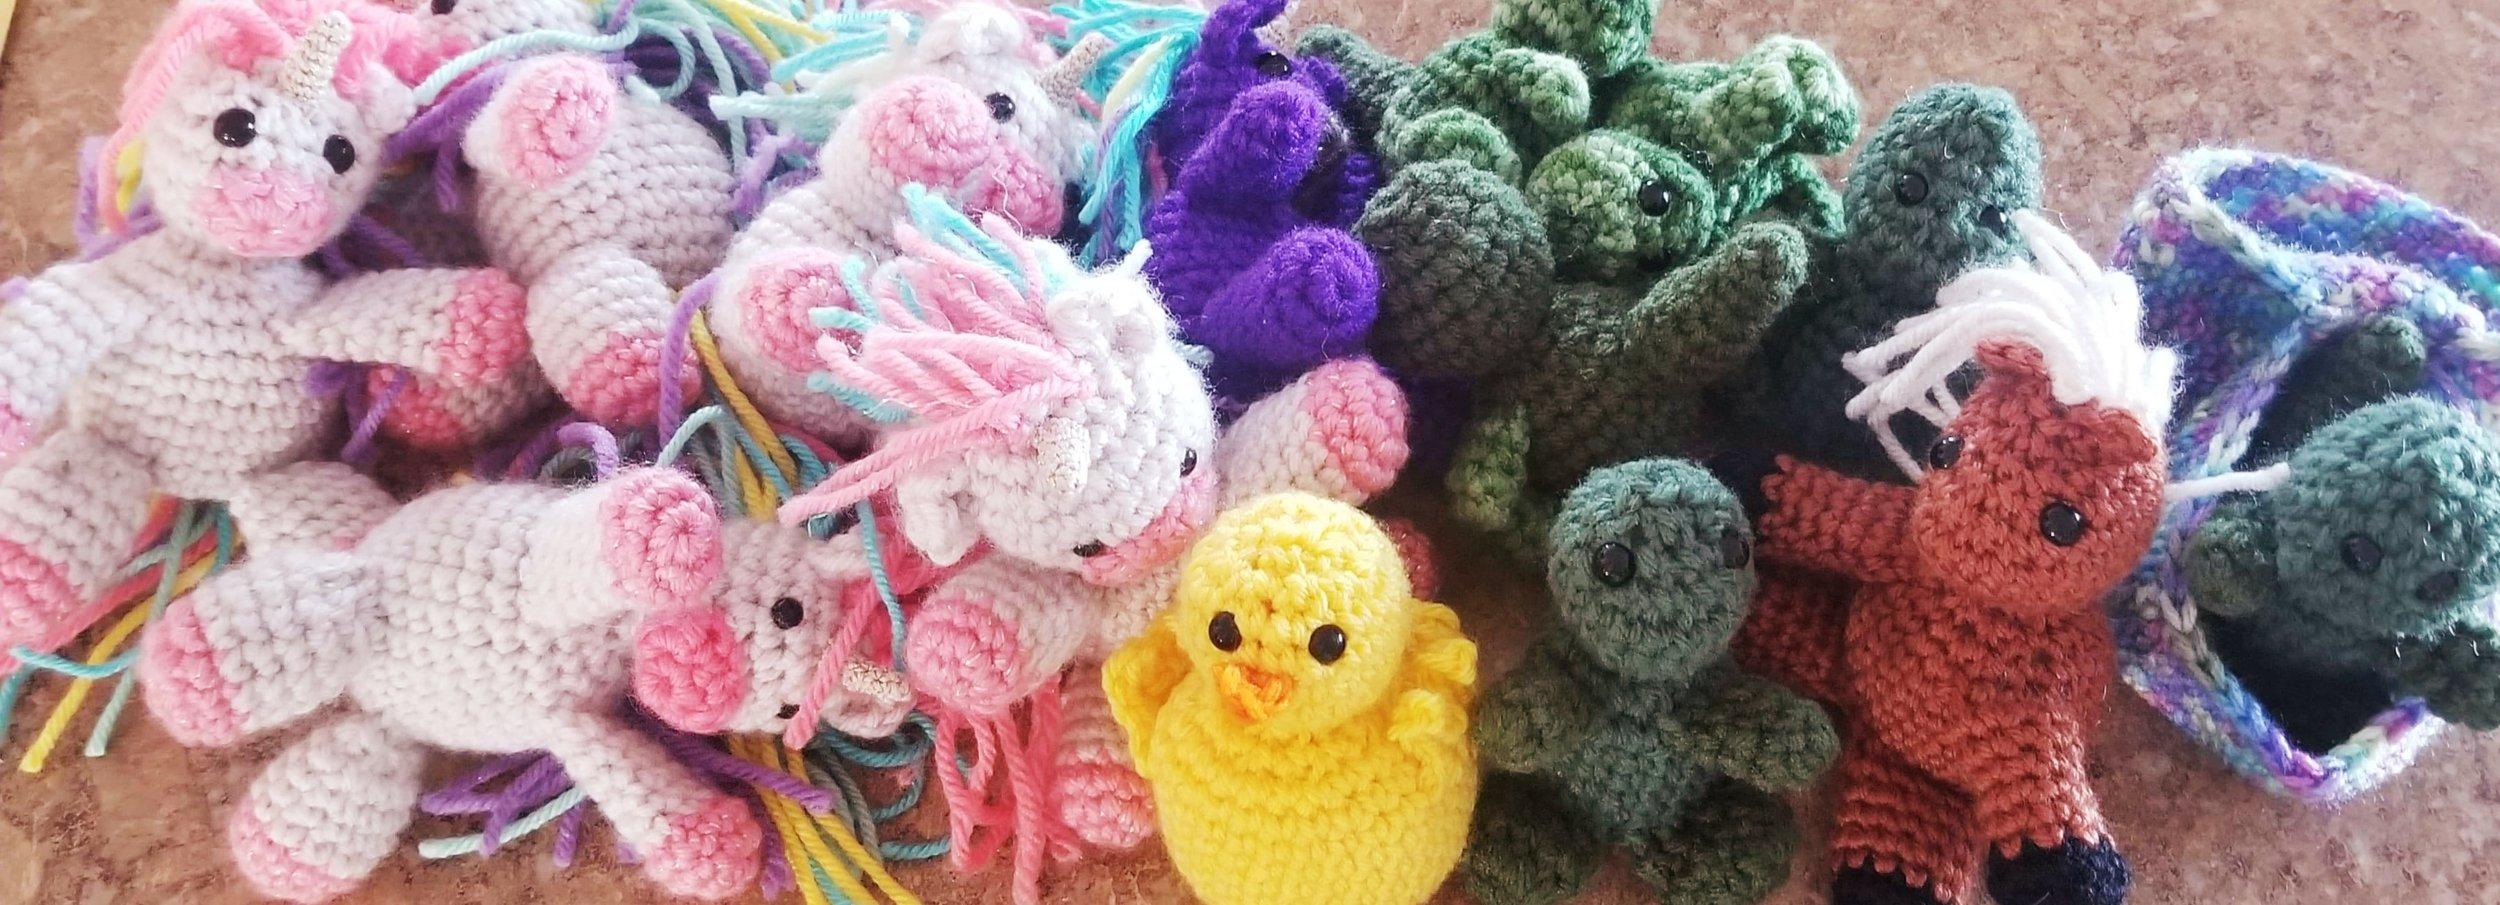 Learn How to Crochet - Basic Beginner Amigurumi Smiley Face Ball ... | 362x1000